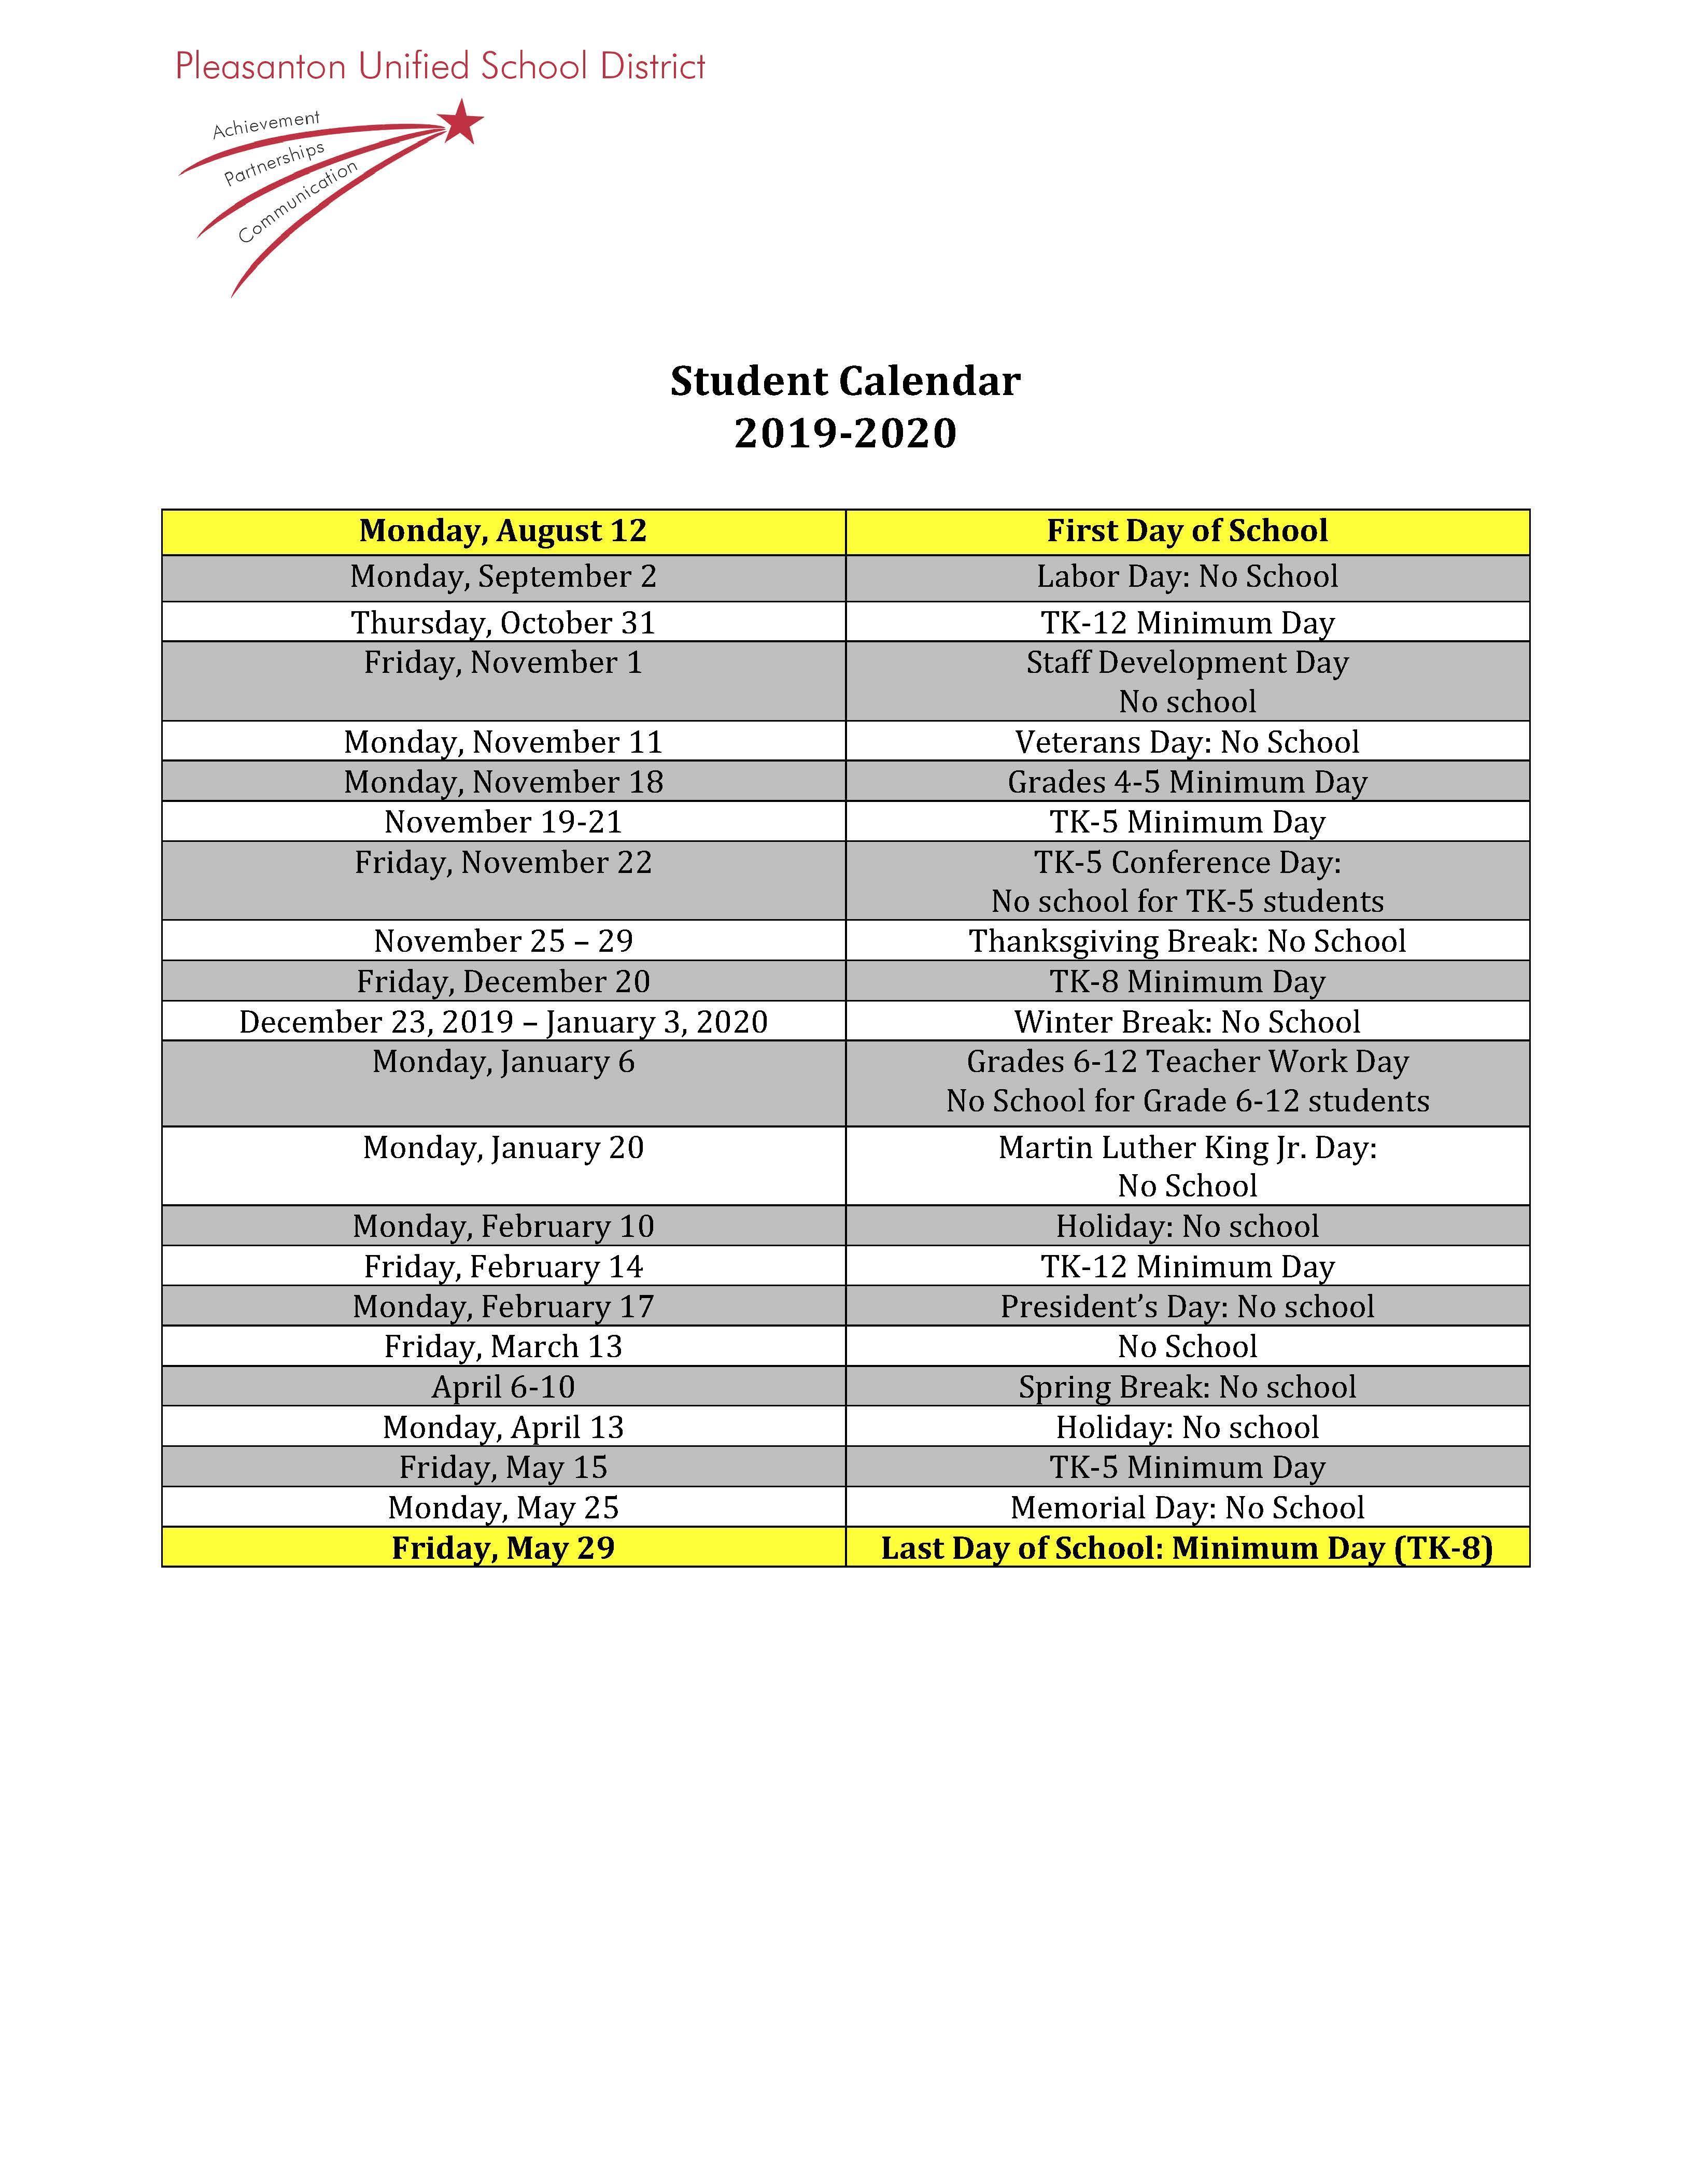 Calendars - Miscellaneous - Pleasanton Unified School District With Morgan Hill Unified School District Calendar